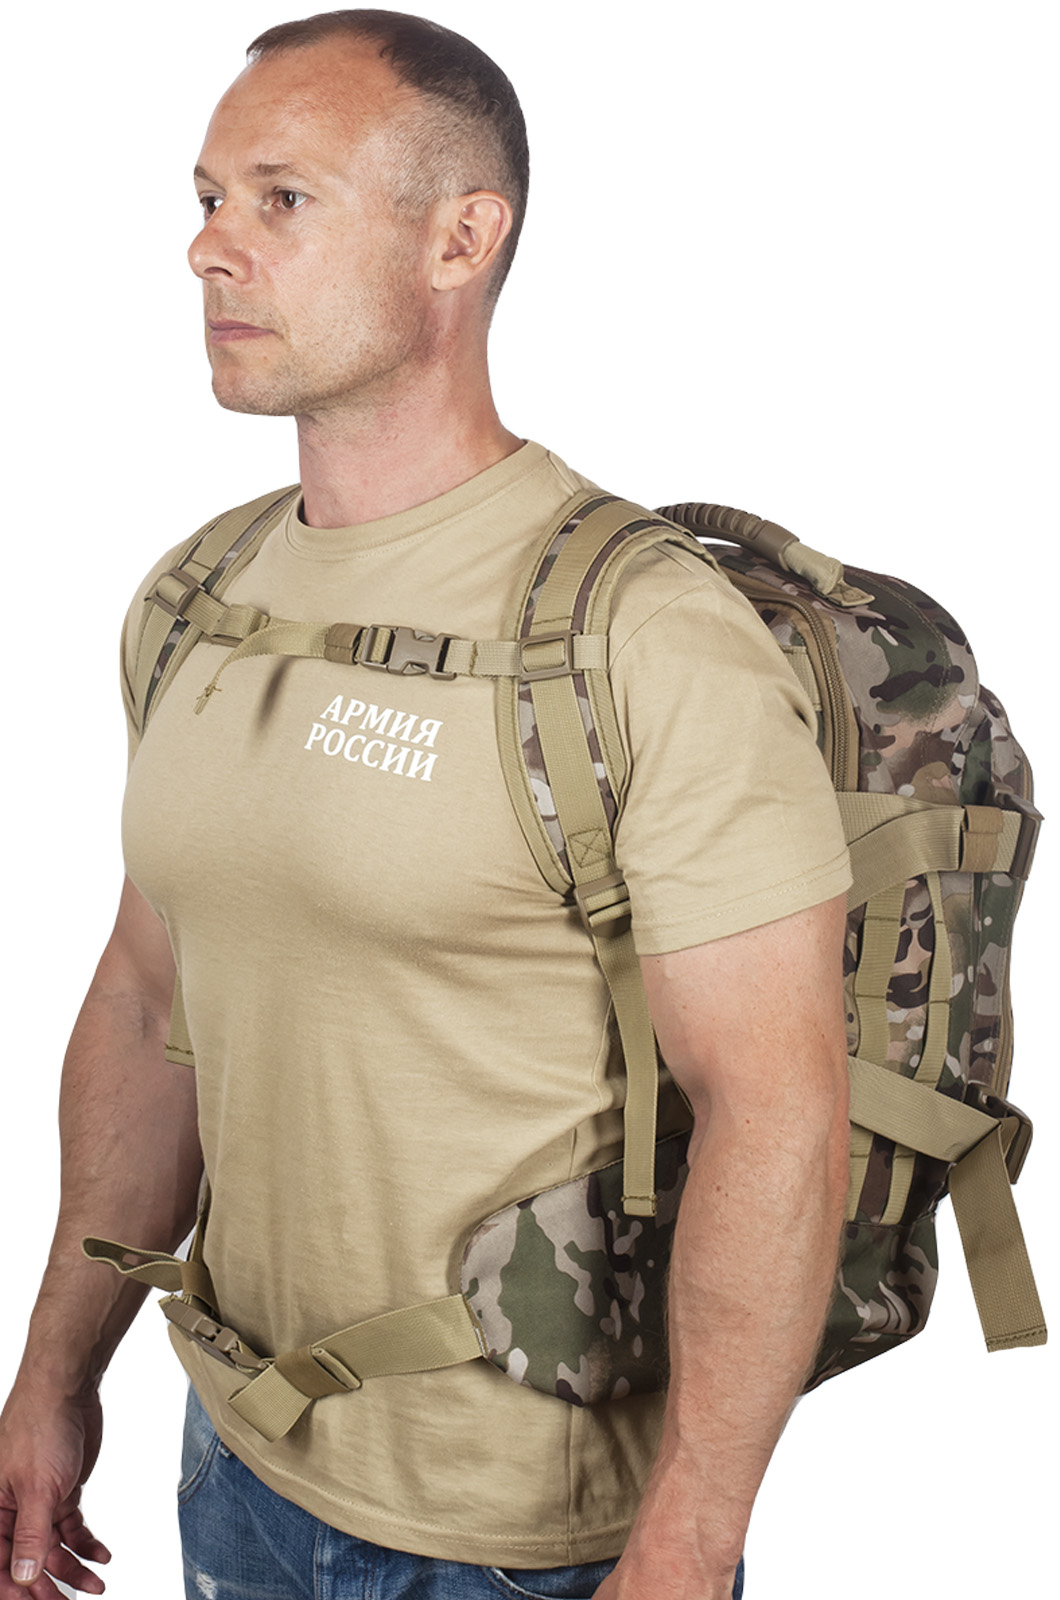 Тактический ранец 3-Day Expandable Backpack 08002A OCP по выгодной цене